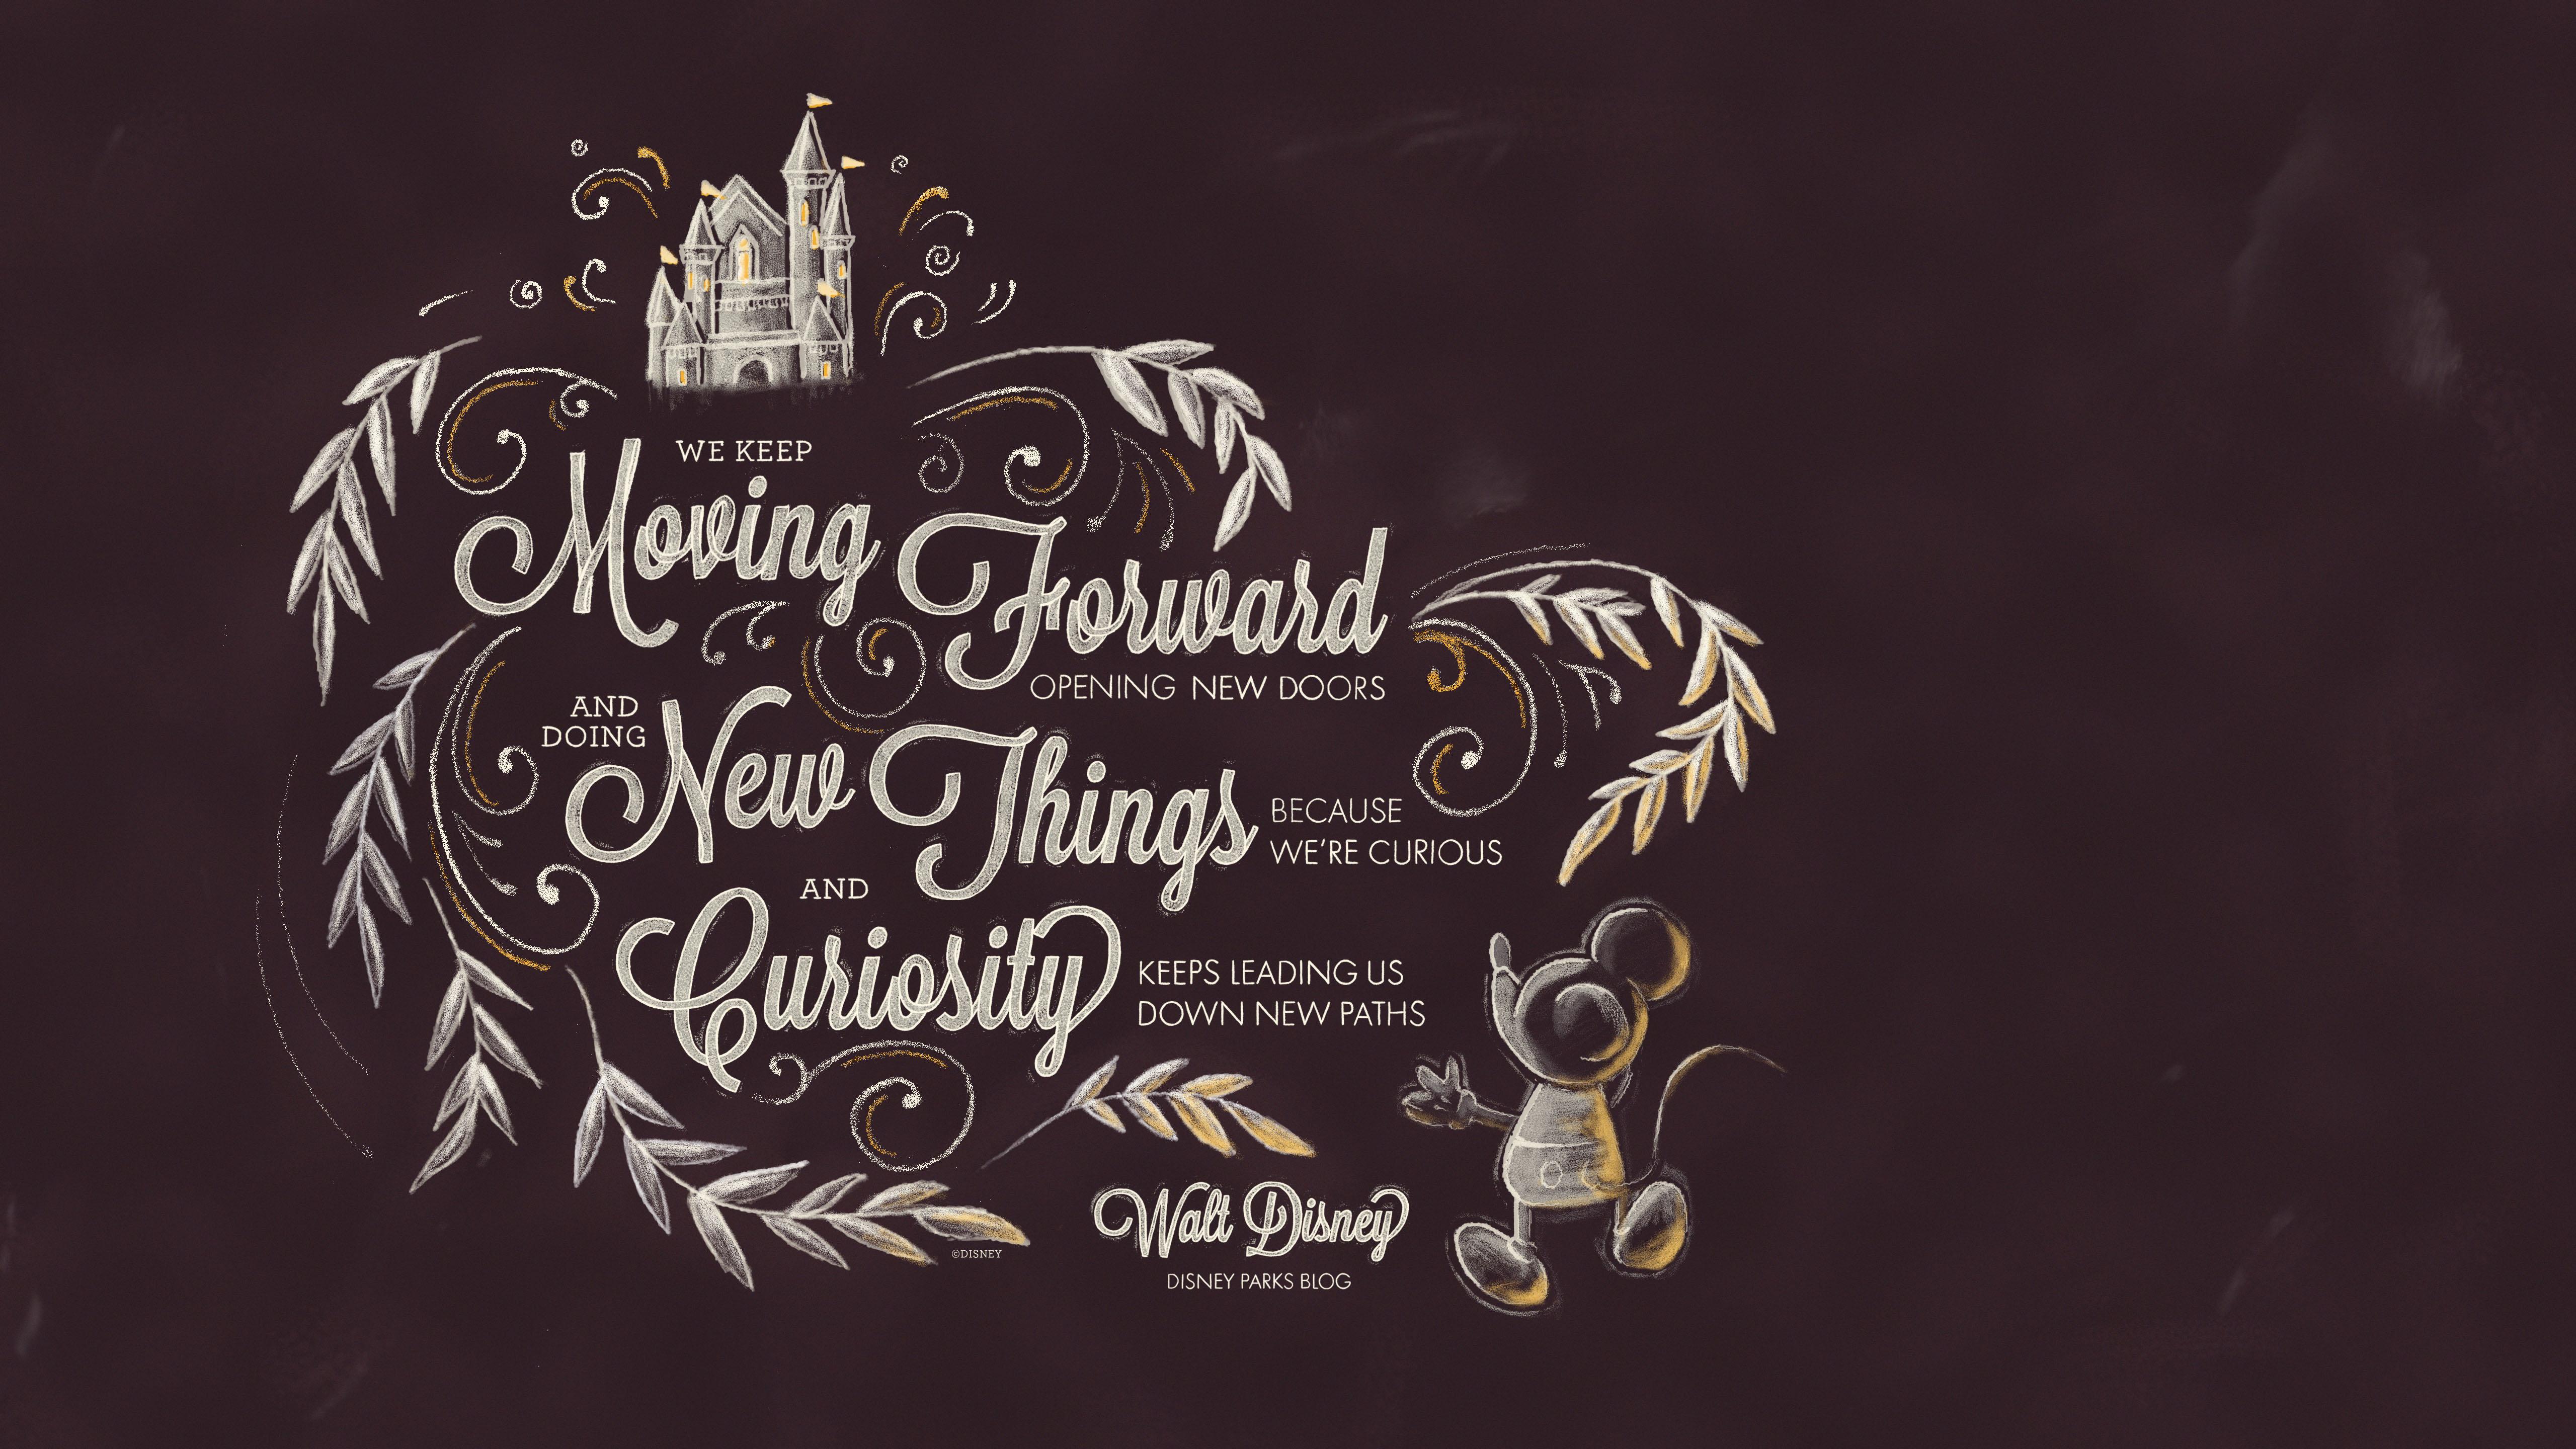 Exclusive Walt Disney DesktopMobile Wallpaper Disney Parks Blog 5120x2880